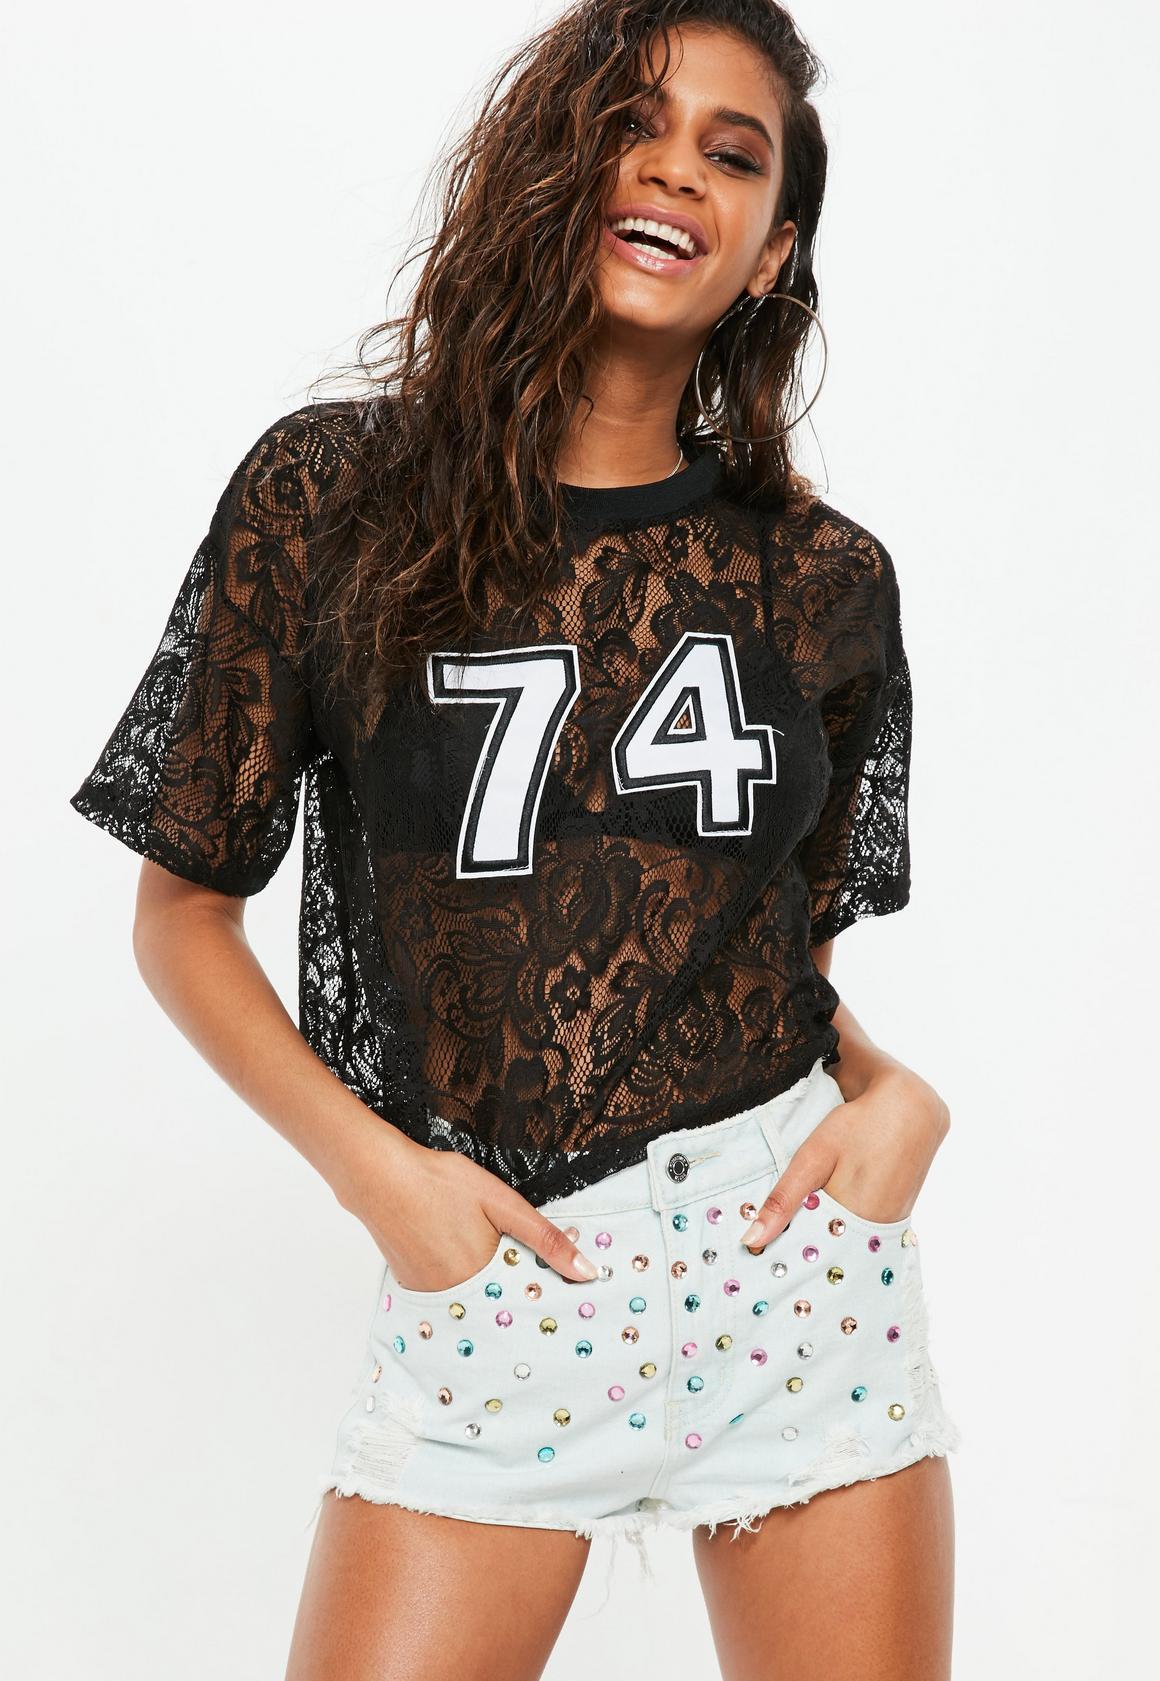 Black t shirt with lace - Black Lace Graphic T Shirt